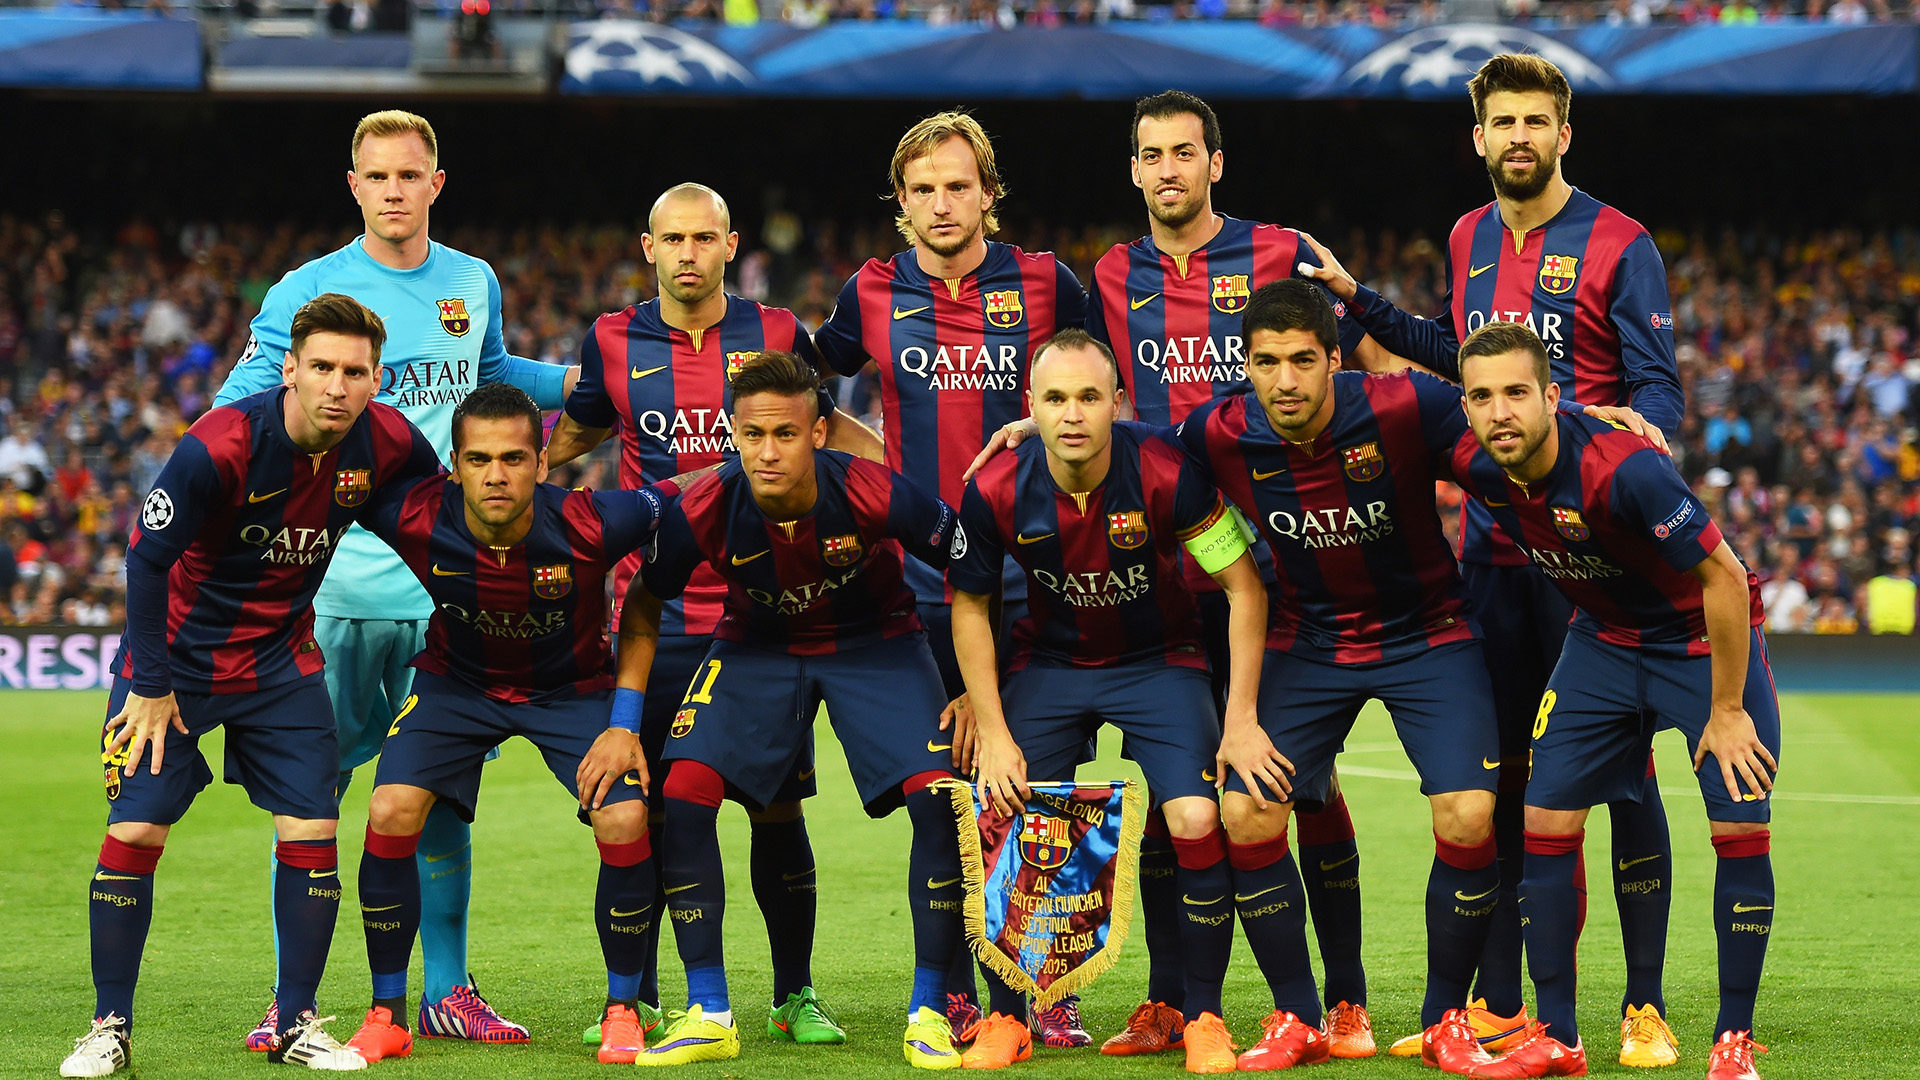 Image Result For Vivo Vs En Vivo Highlights Champions League Final